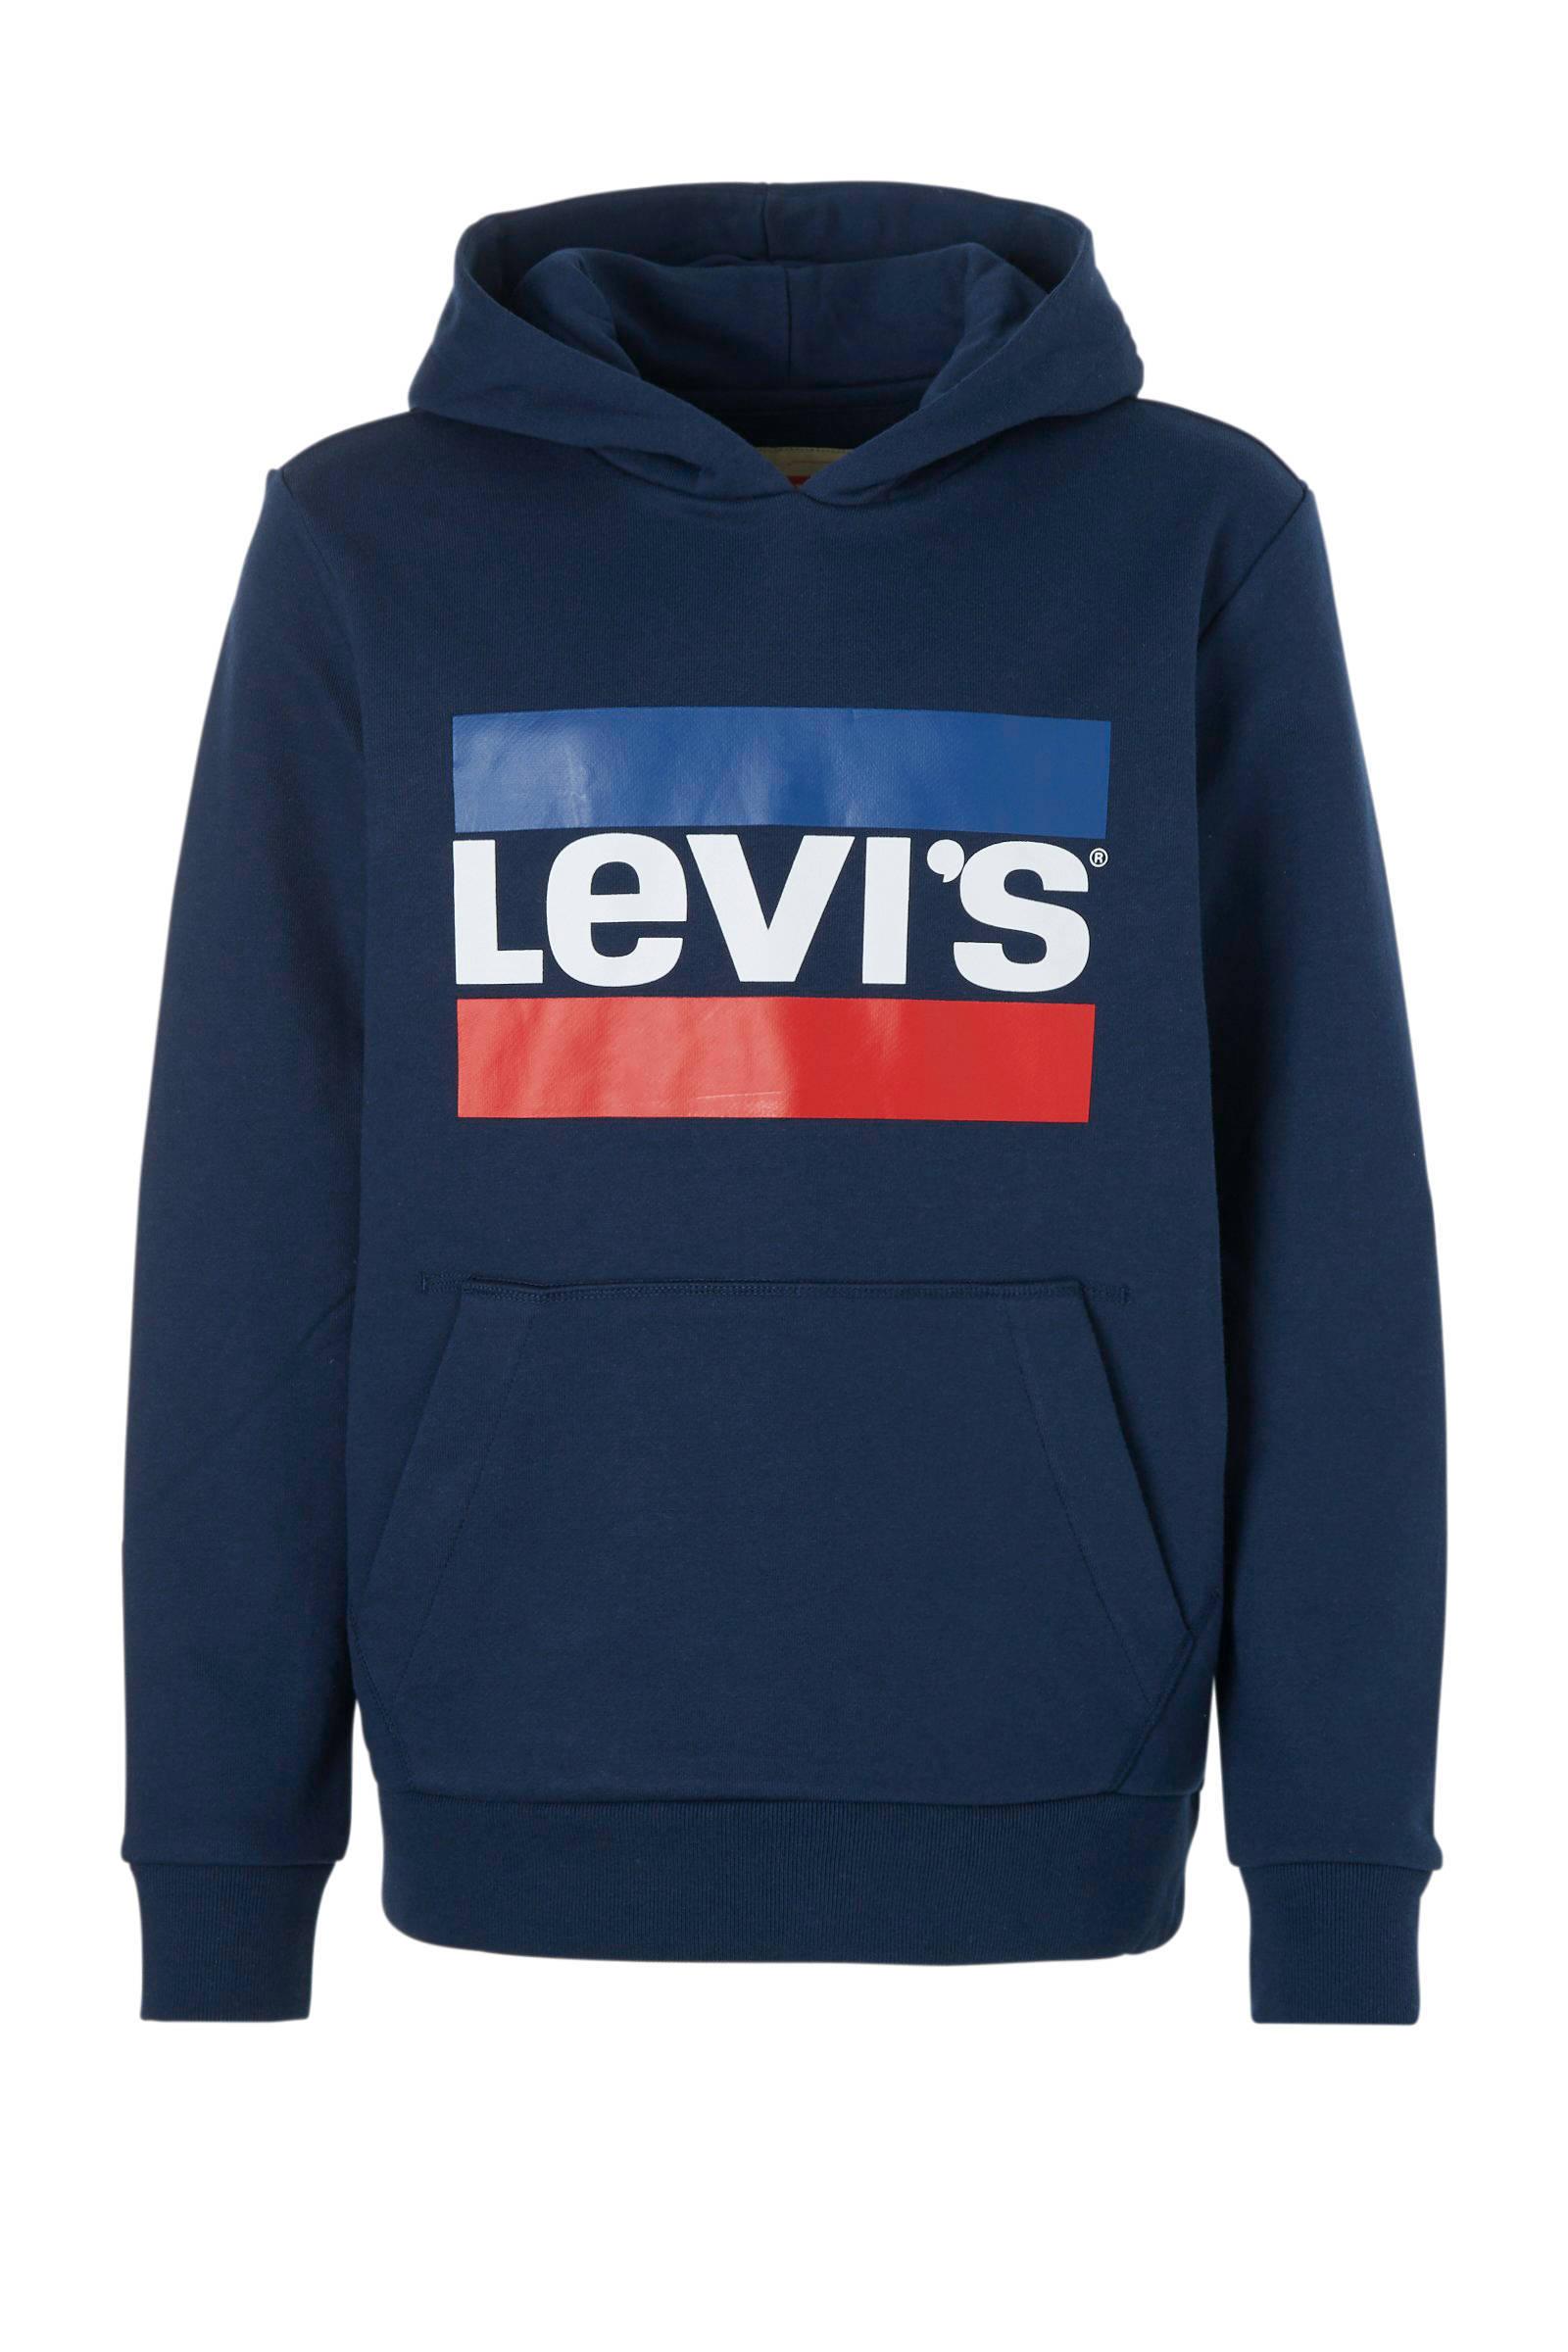 Levi's kids Levi's Kids sweater met logo donkerblauw | wehkamp